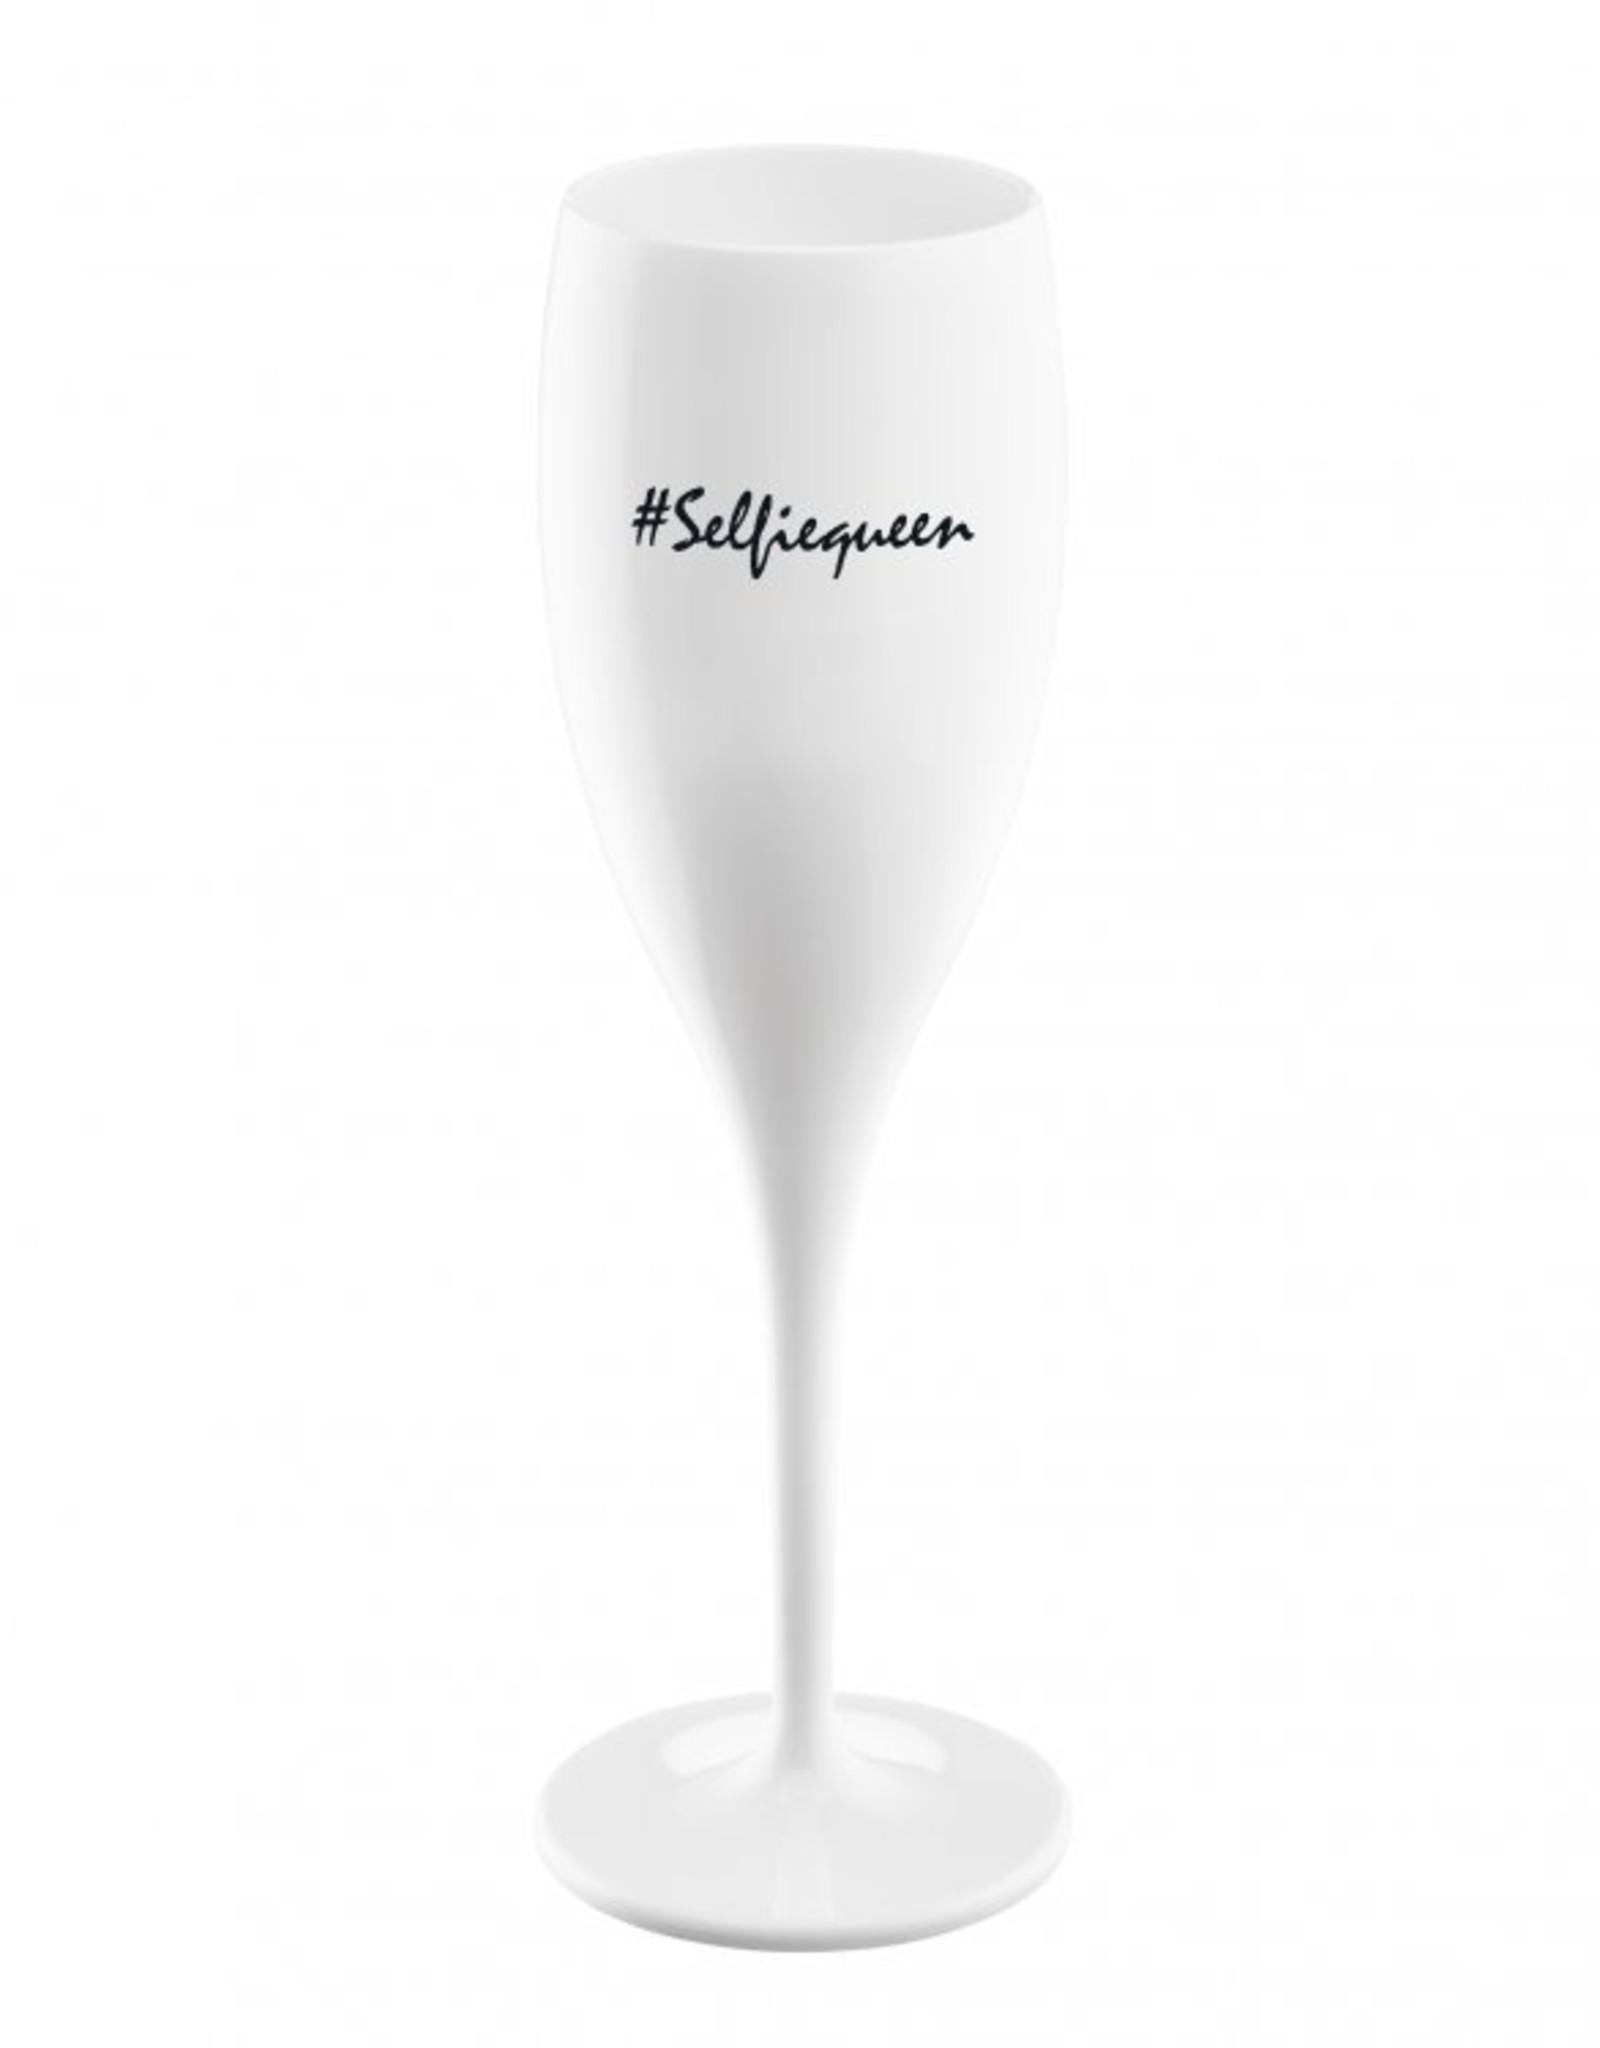 Koziol Koziol Champagneglas - Cheers No.1 Selfiequeen - 100 ml - Cotton white - Set van 6